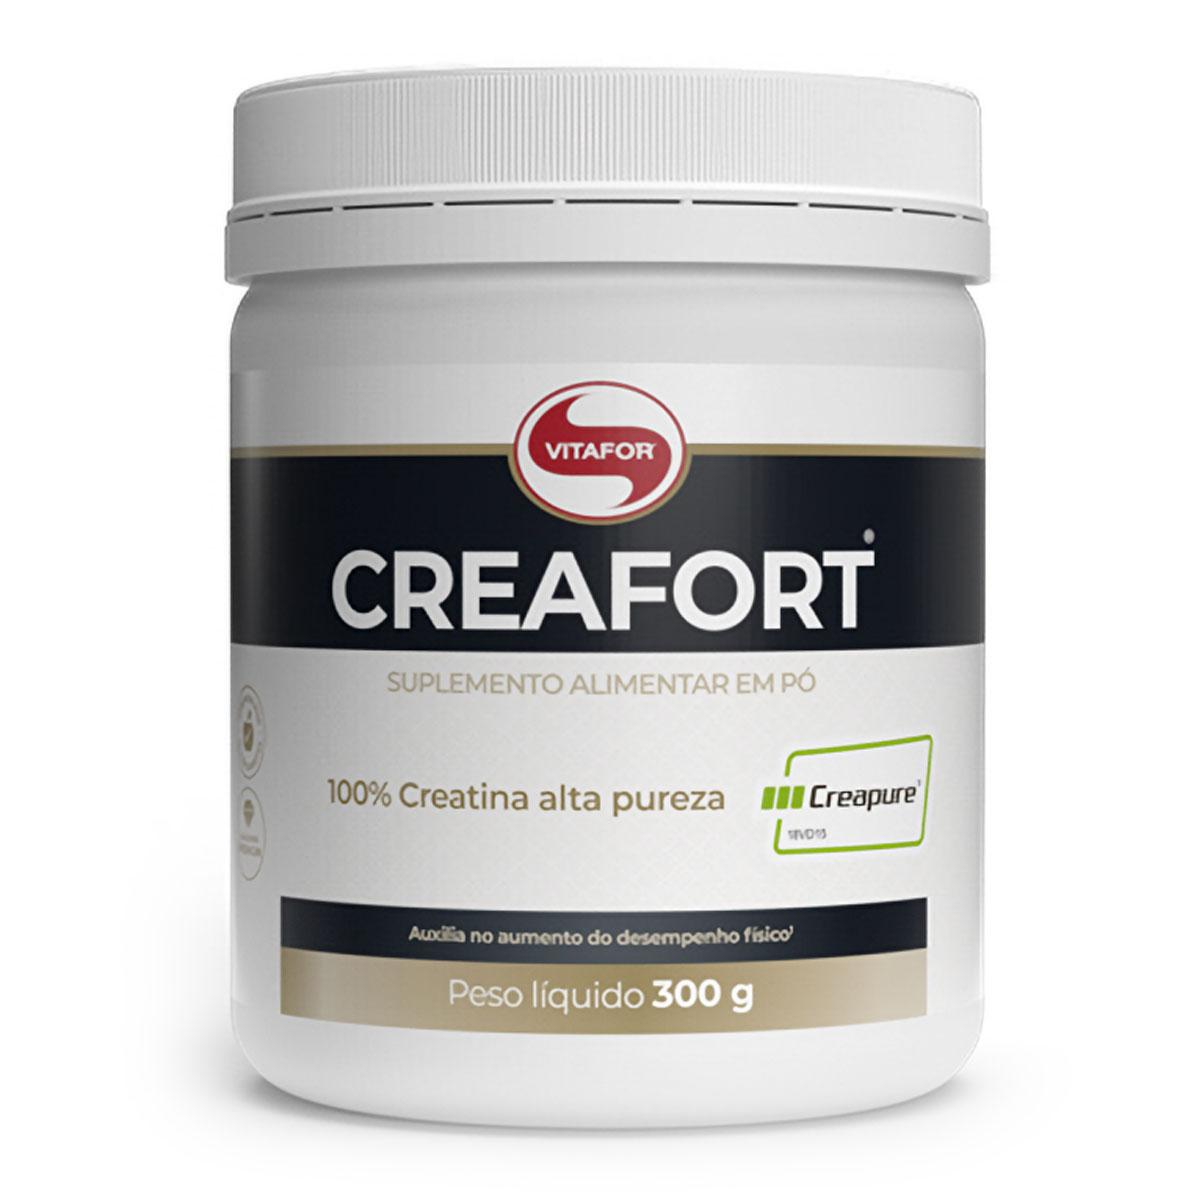 Creafort Creapure (300g) - Vitafor